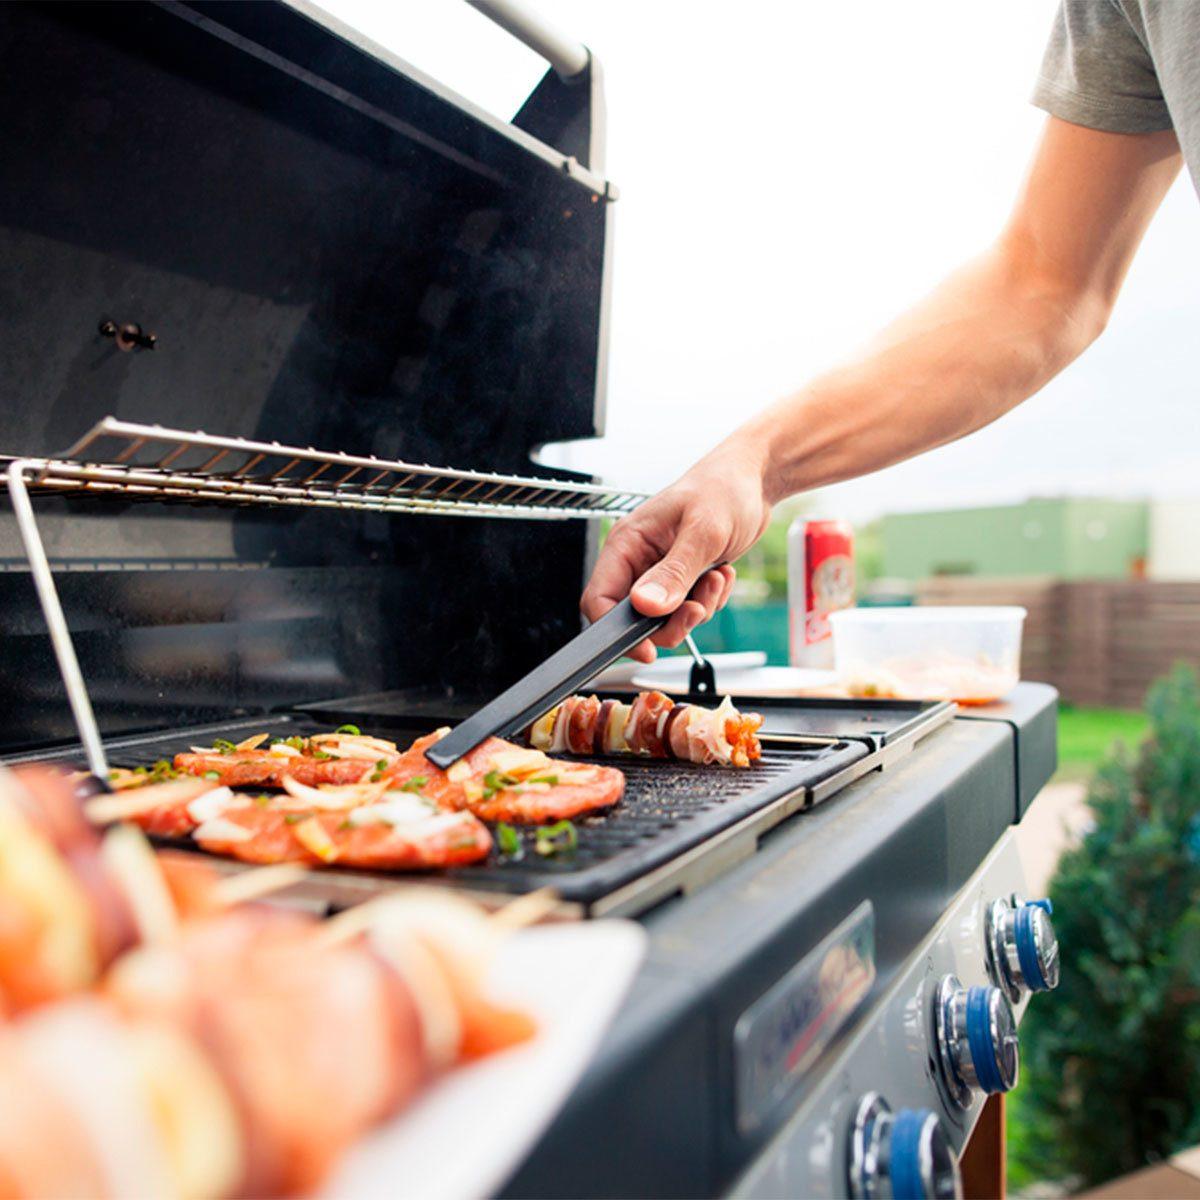 grill grilling hamburgers and kebabs